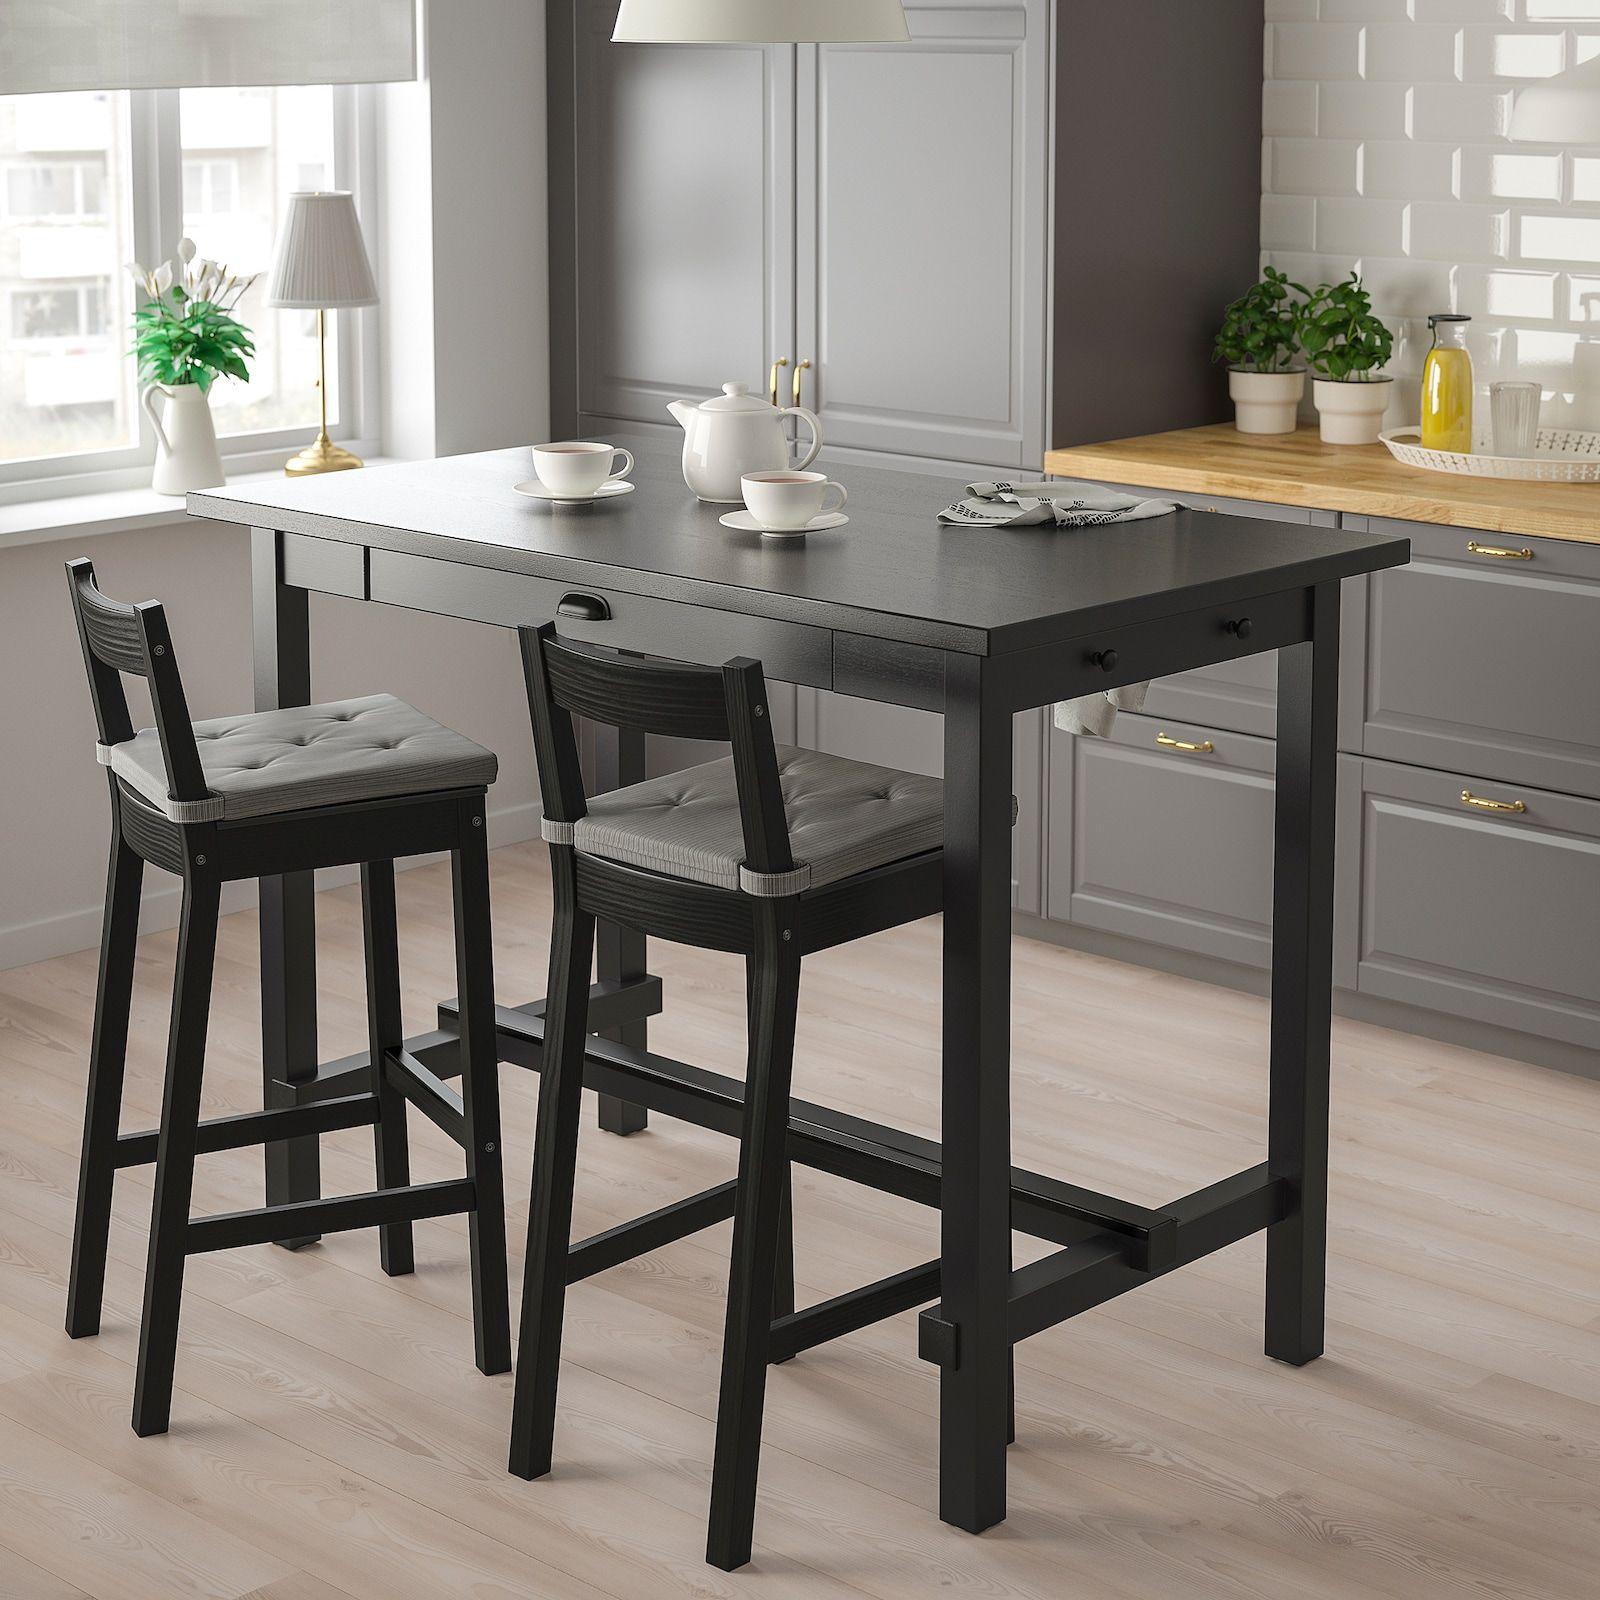 NORDVIKEN Bar table, black, 9 9/9x39 9/9